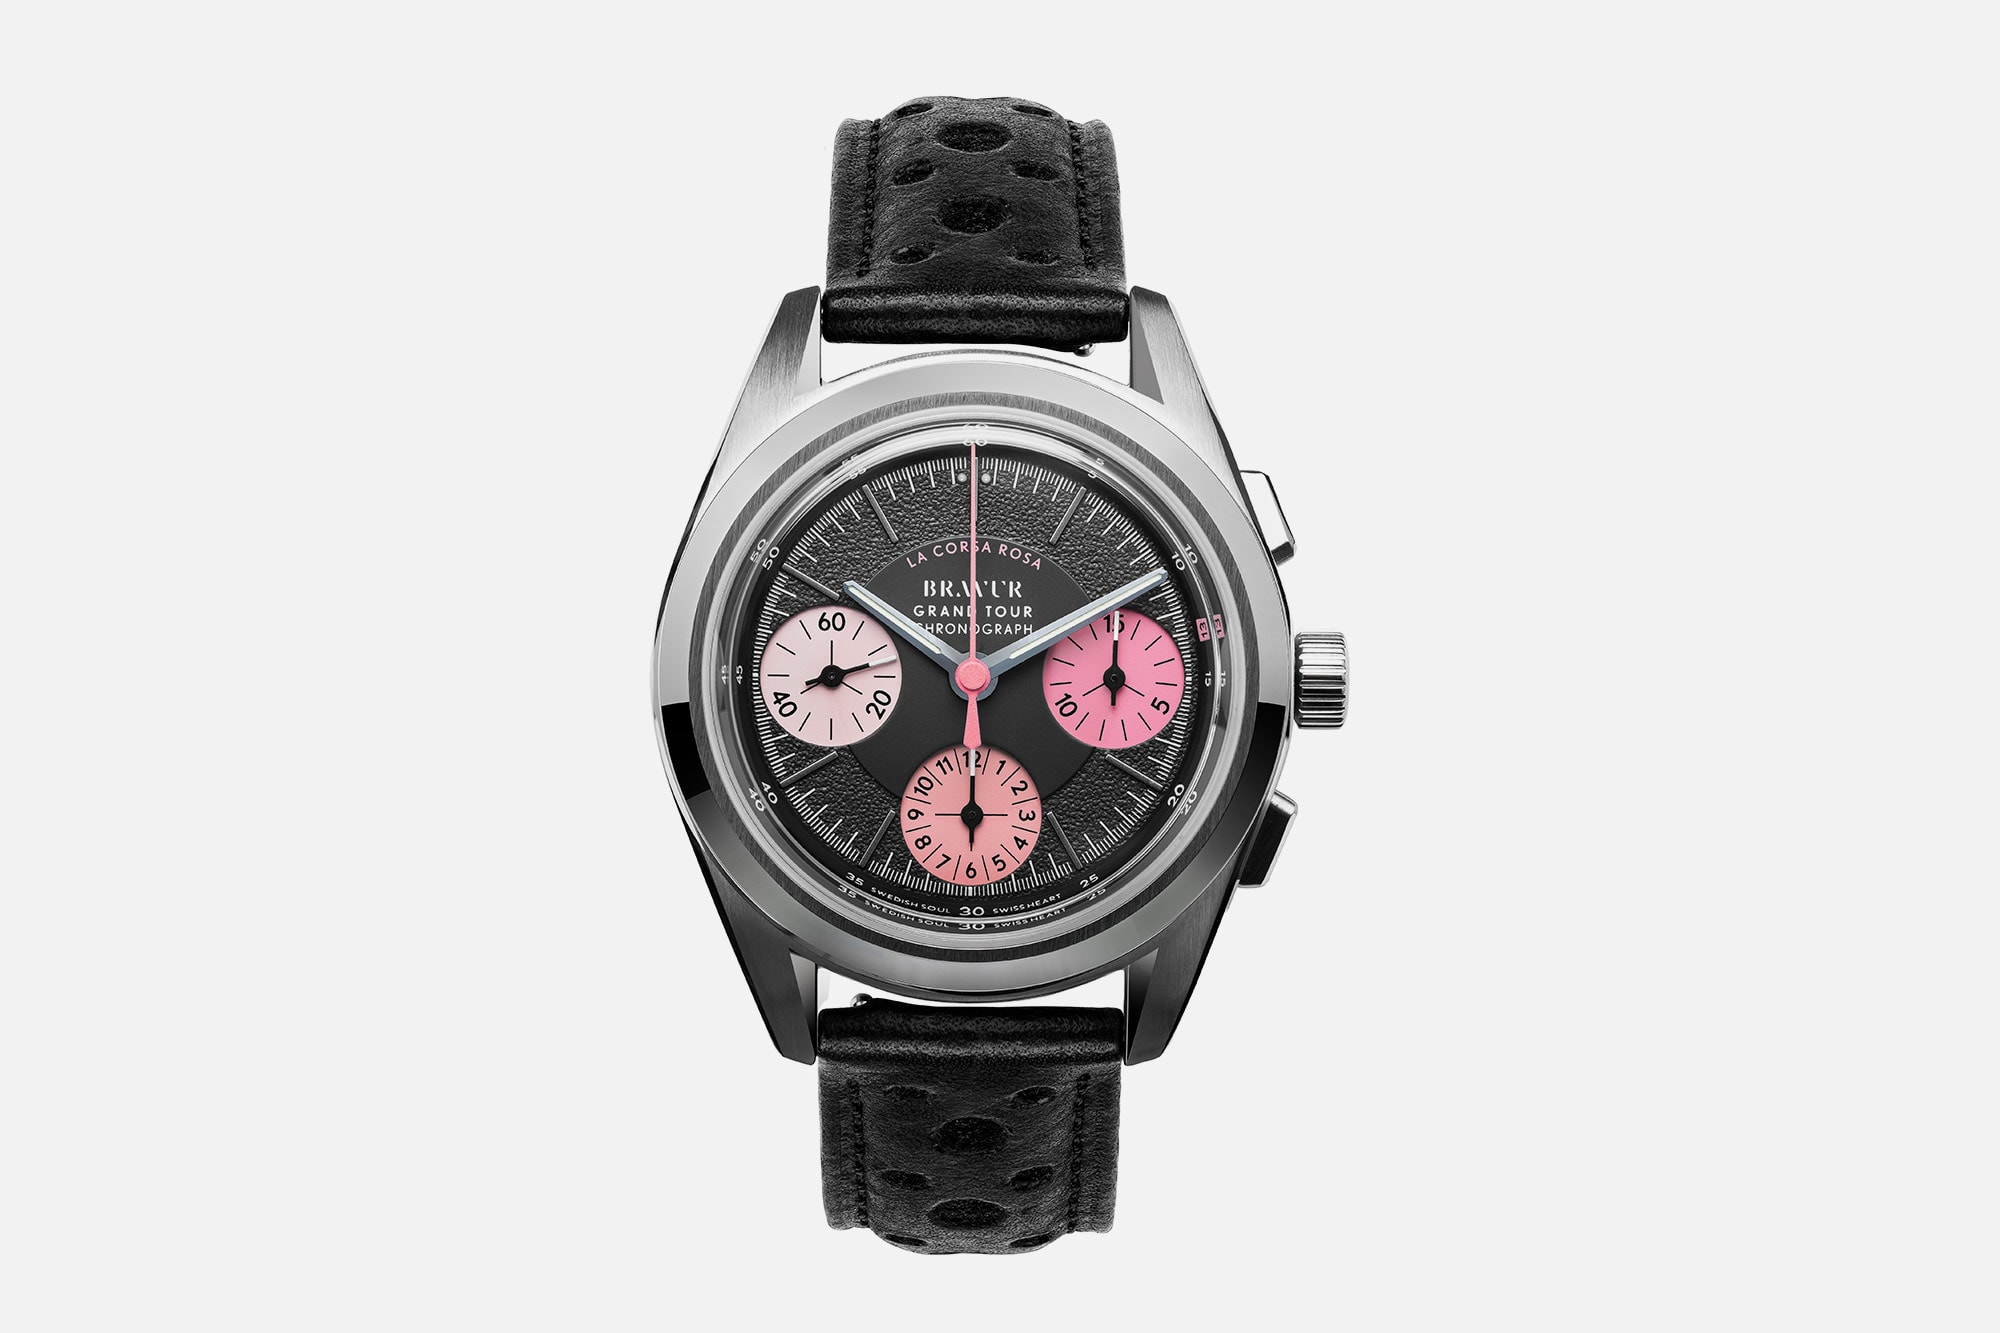 Watch-watch: Det svenske mærke Bravur frigiver smuk lyserød Giro-tema ur